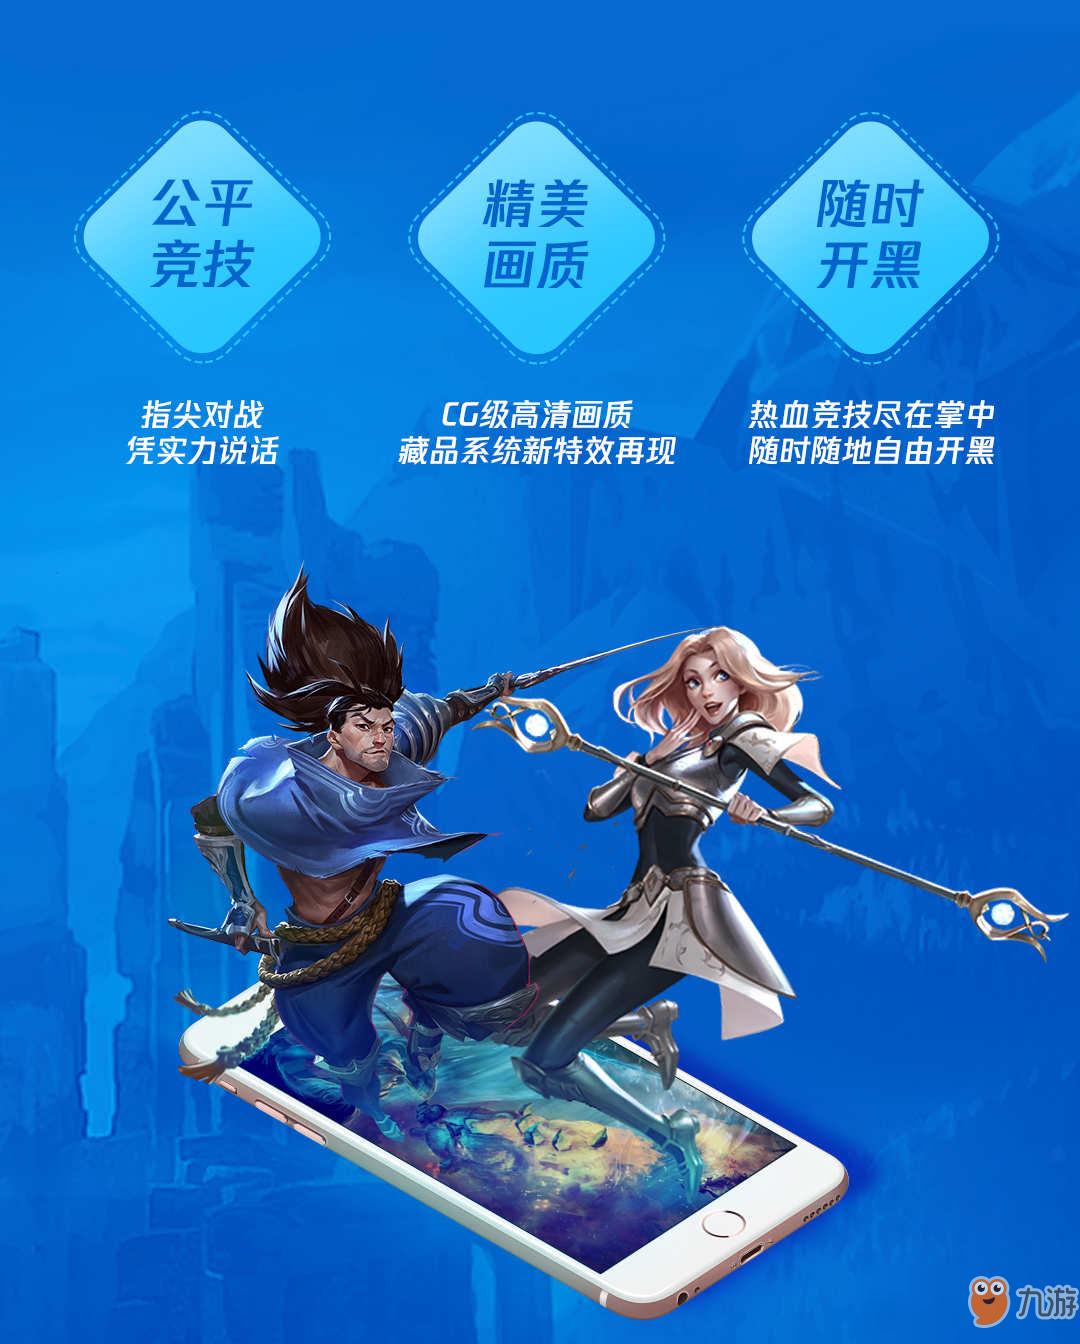 《<a id='link_pop' class='keyword-tag' href='http://www.9game.cn/lolsy/'>英雄联盟手游</a>》游戏名字大全